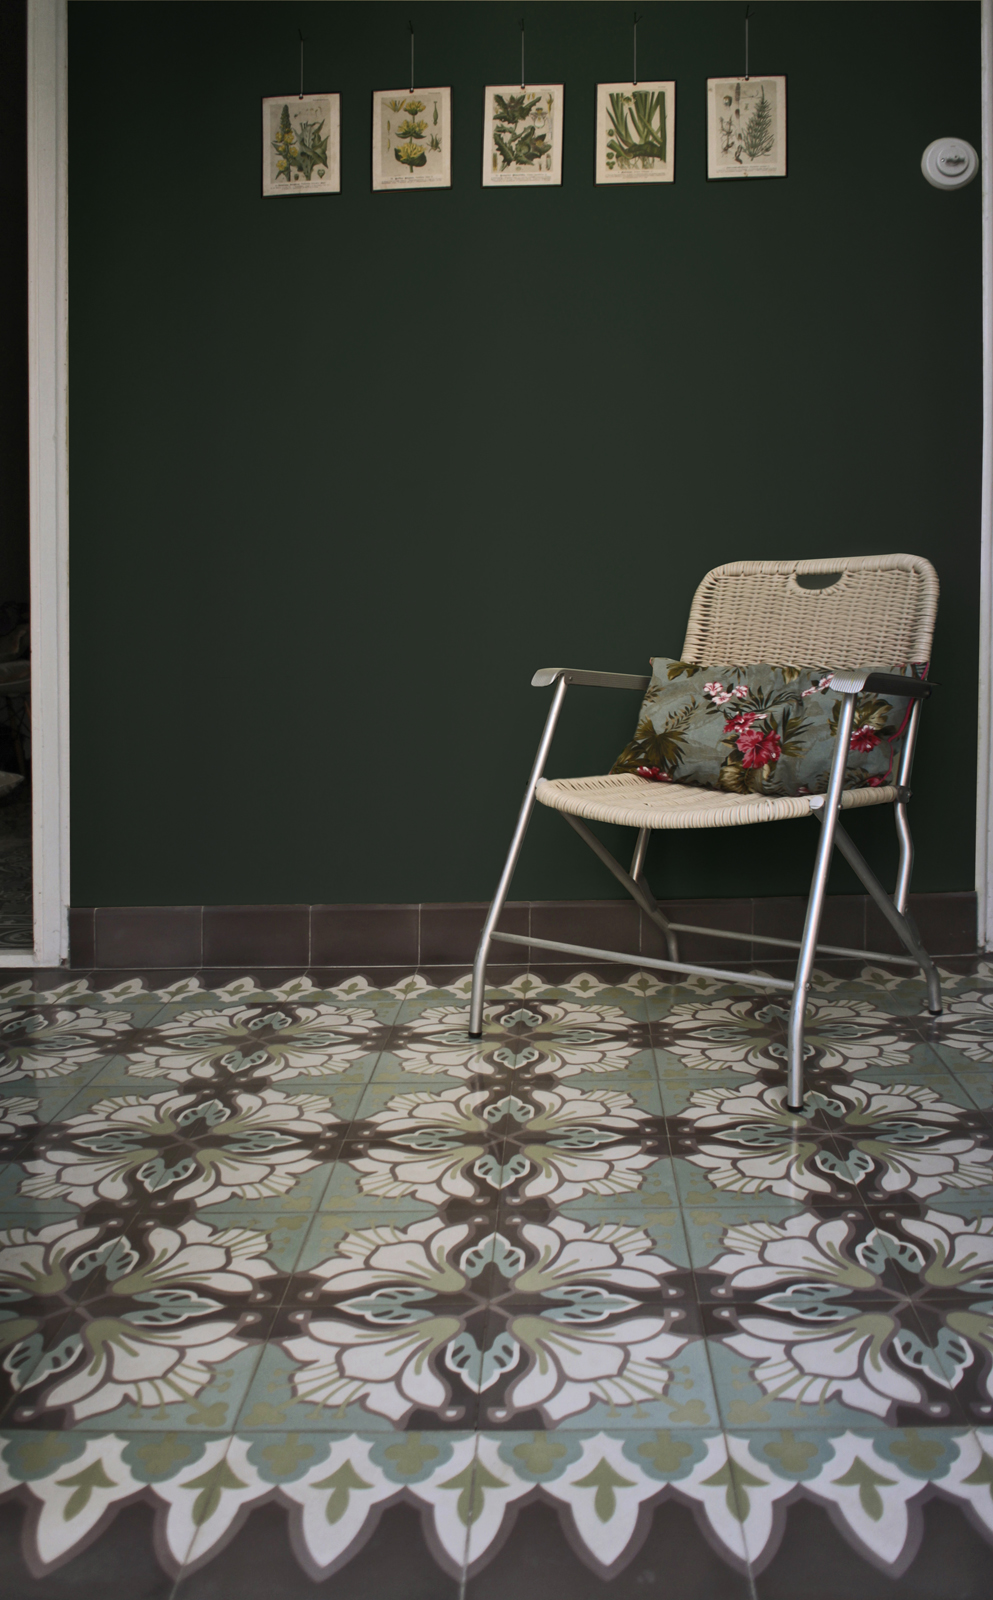 zementfliesen-terrazzofliesen-kreidefarbe-waldgruen-terrazzo-fugenlos-viaplatten-wintergarten